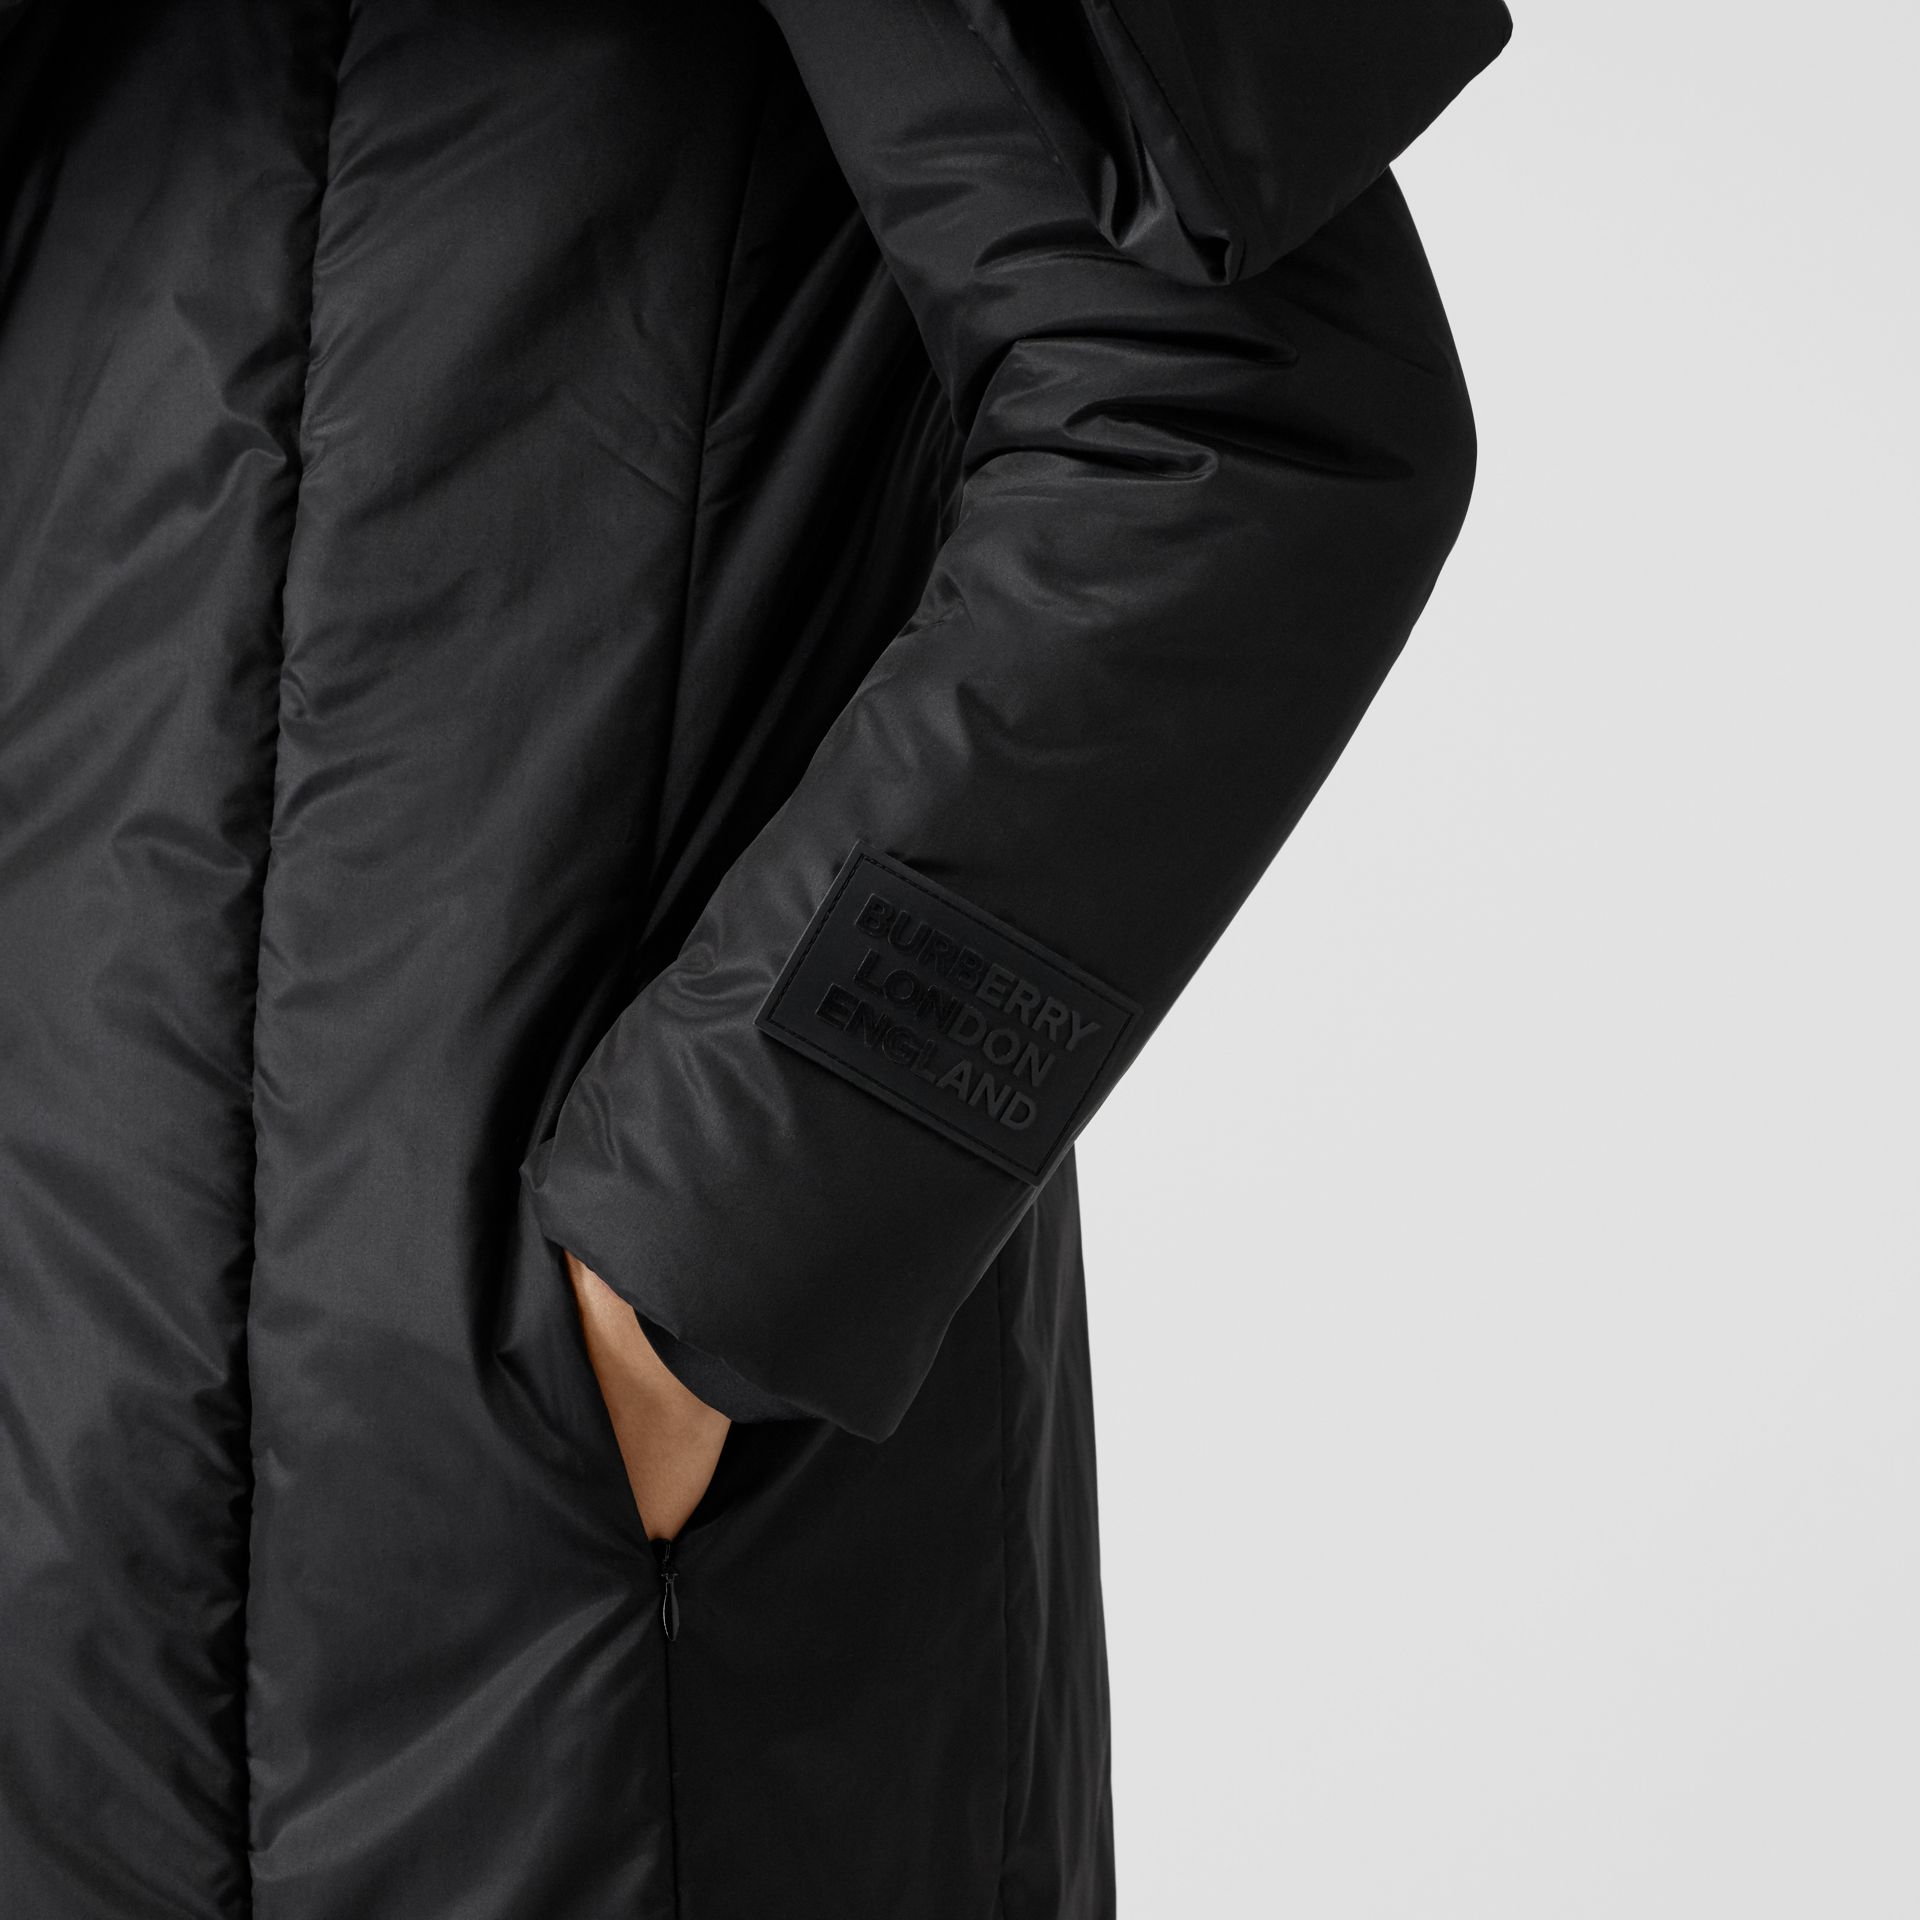 Cape Detail Silk Blend Wrap Coat in Black - Women | Burberry Singapore - gallery image 4